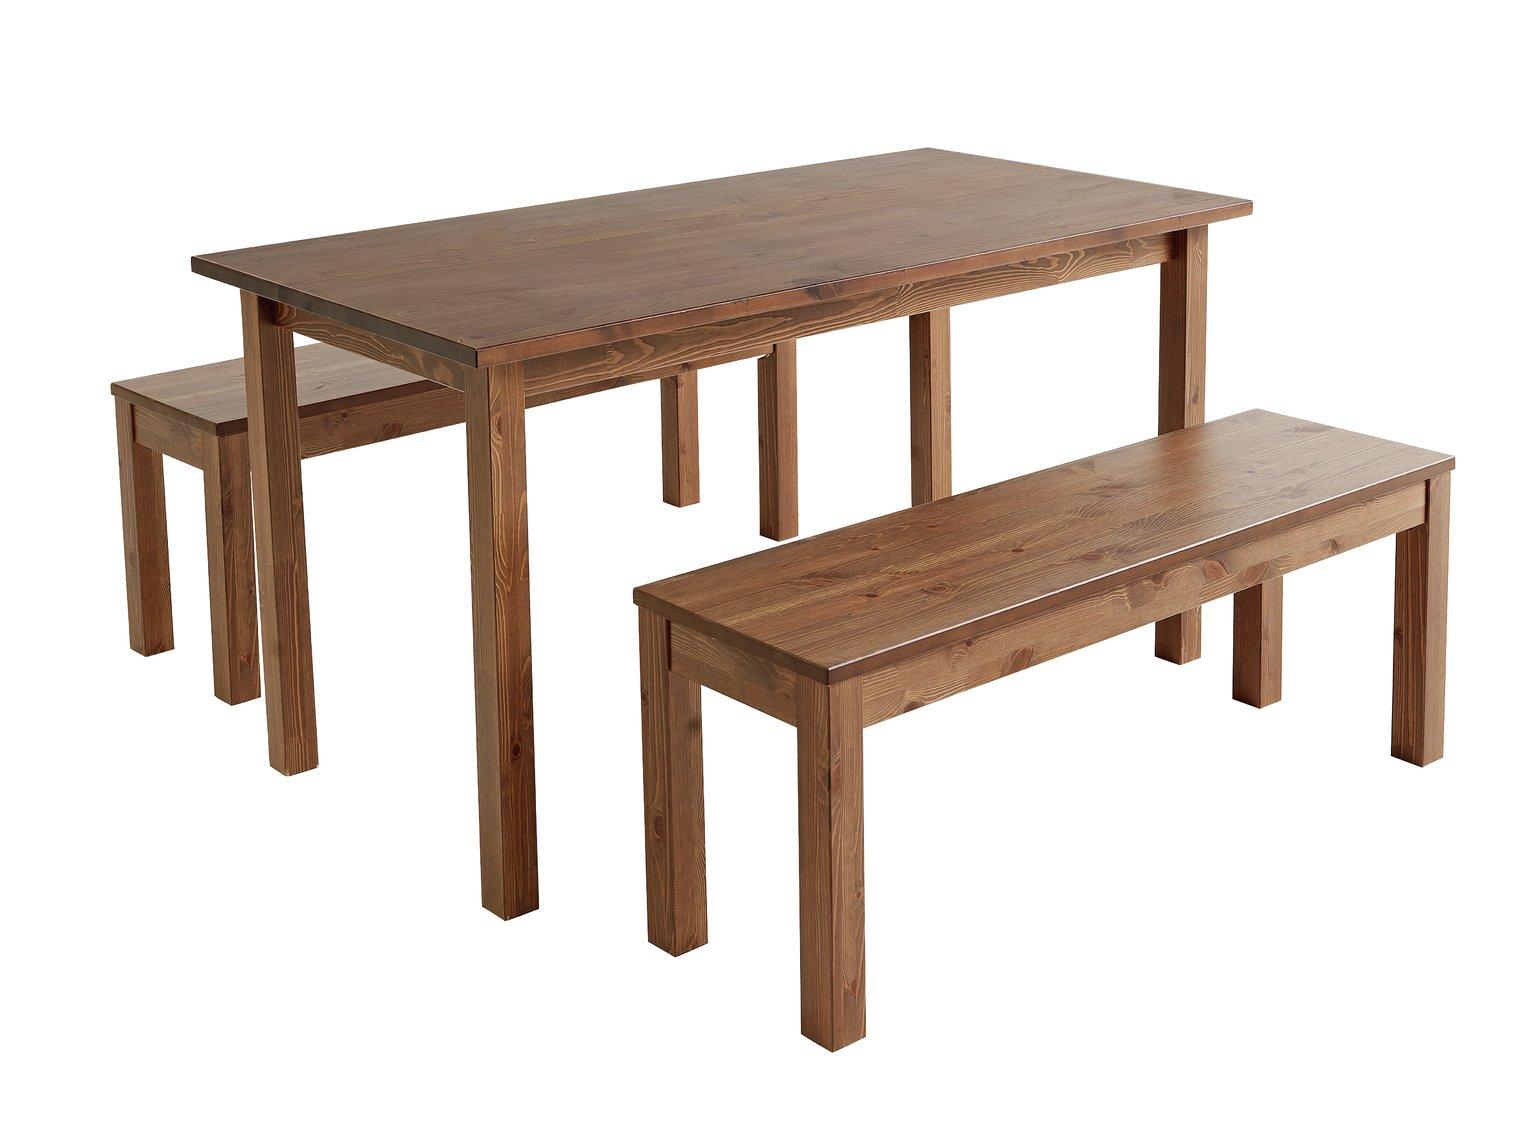 Two Tone Argos Home Ashdon Table and Bench Set